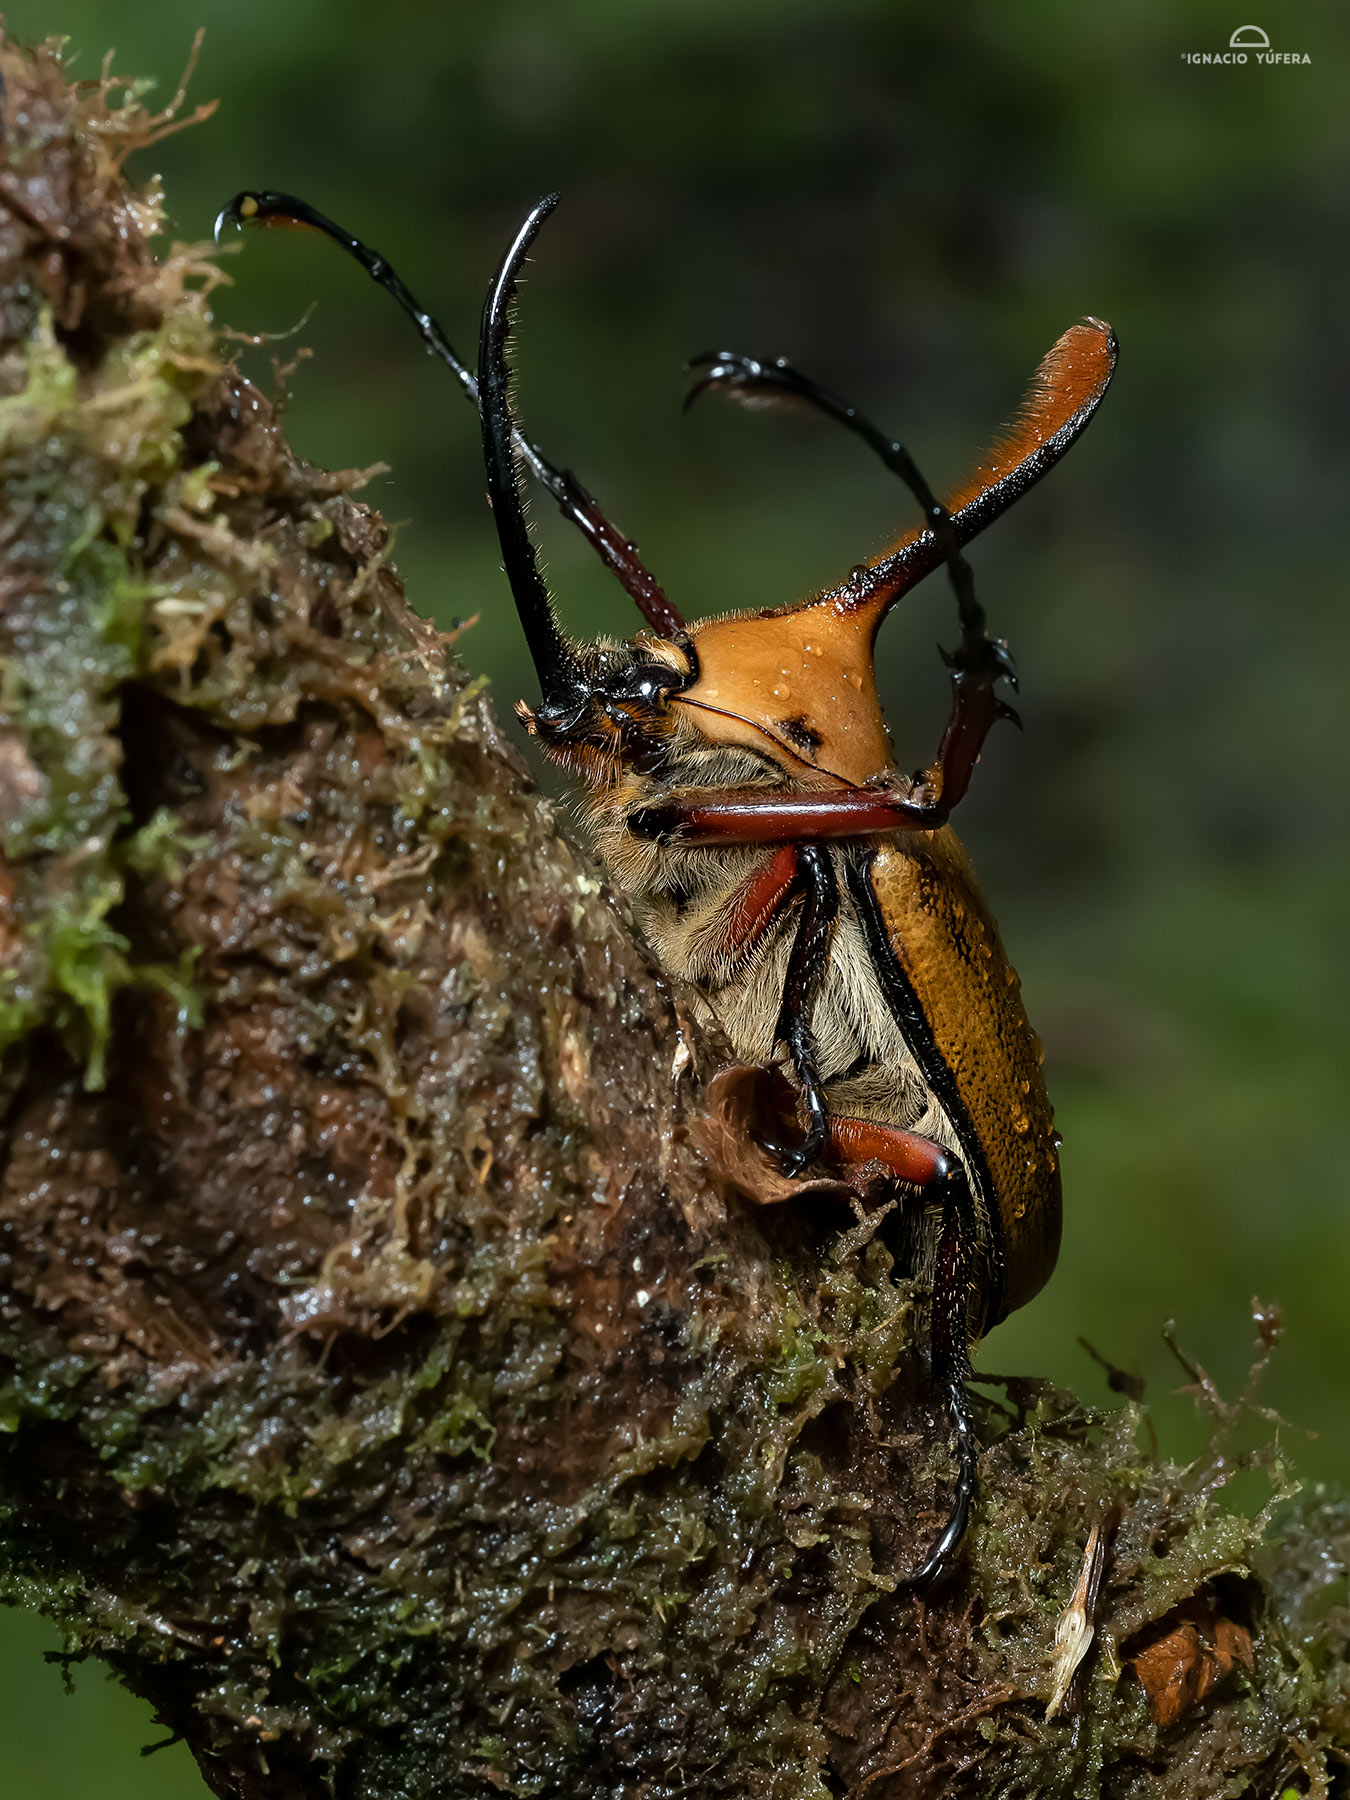 Rhino beetle (Golofa eacus), Madre de Dios, Peru